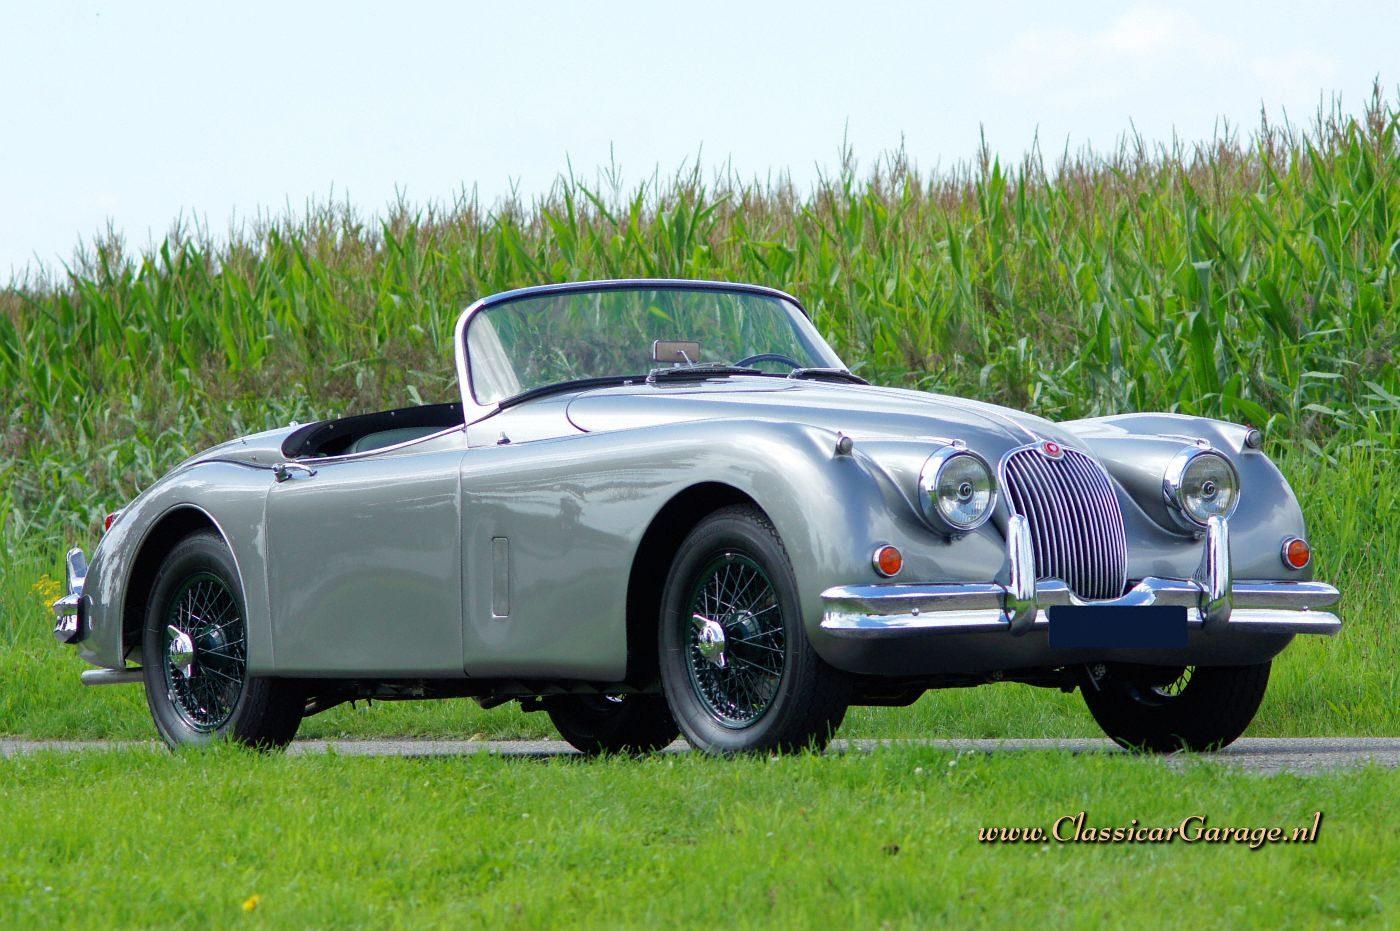 Jaguar Garages Jaguar Xk Litre Ots Roadster 1959 Details